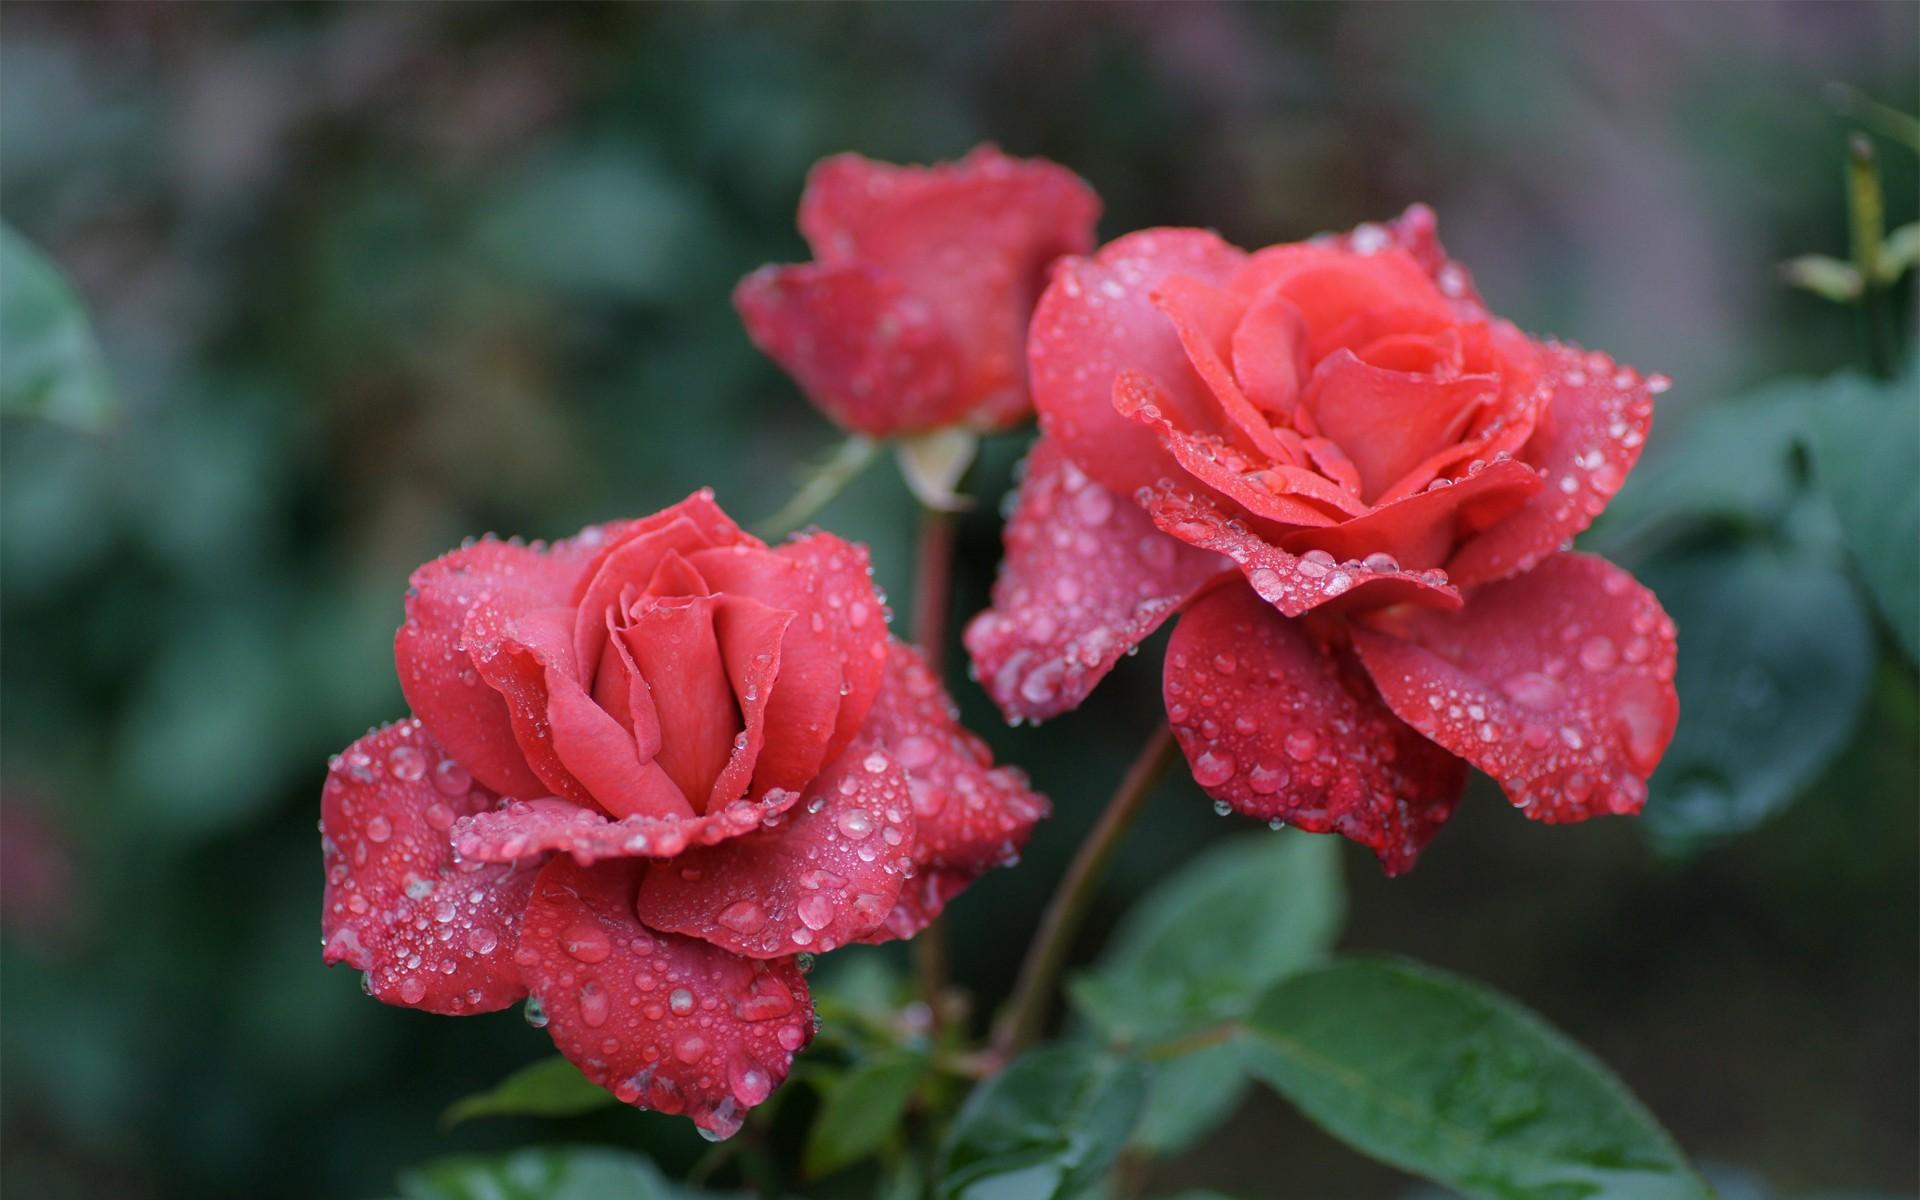 http://www.zastavki.com/pictures/originals/2013/Nature___Flowers_Rose_in_the_morning_dew_042326_.jpg